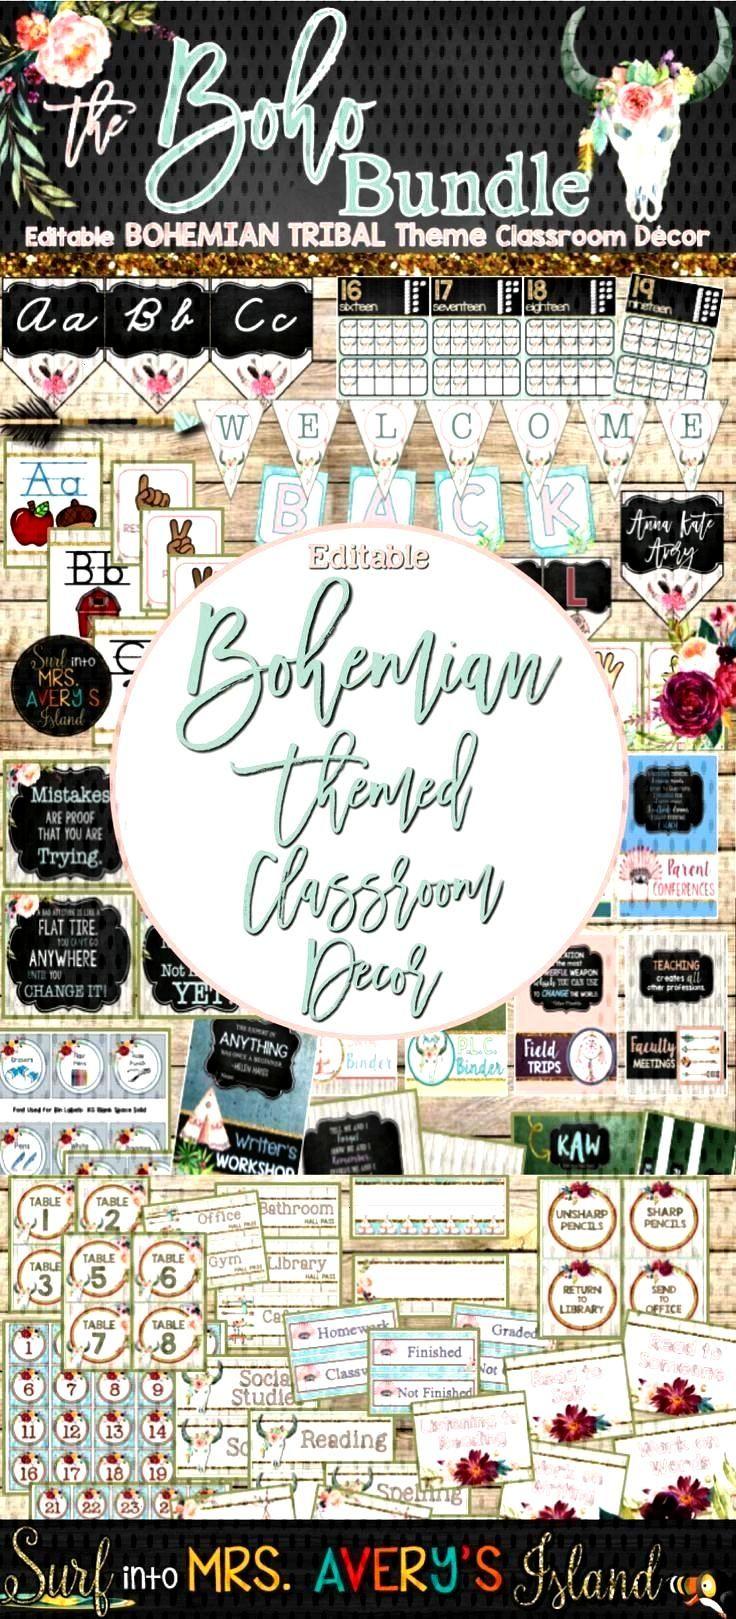 Classroom Themes Decor Bundle - Bohemian Shabby Chic Editable -  Your Boho themed classroom will be